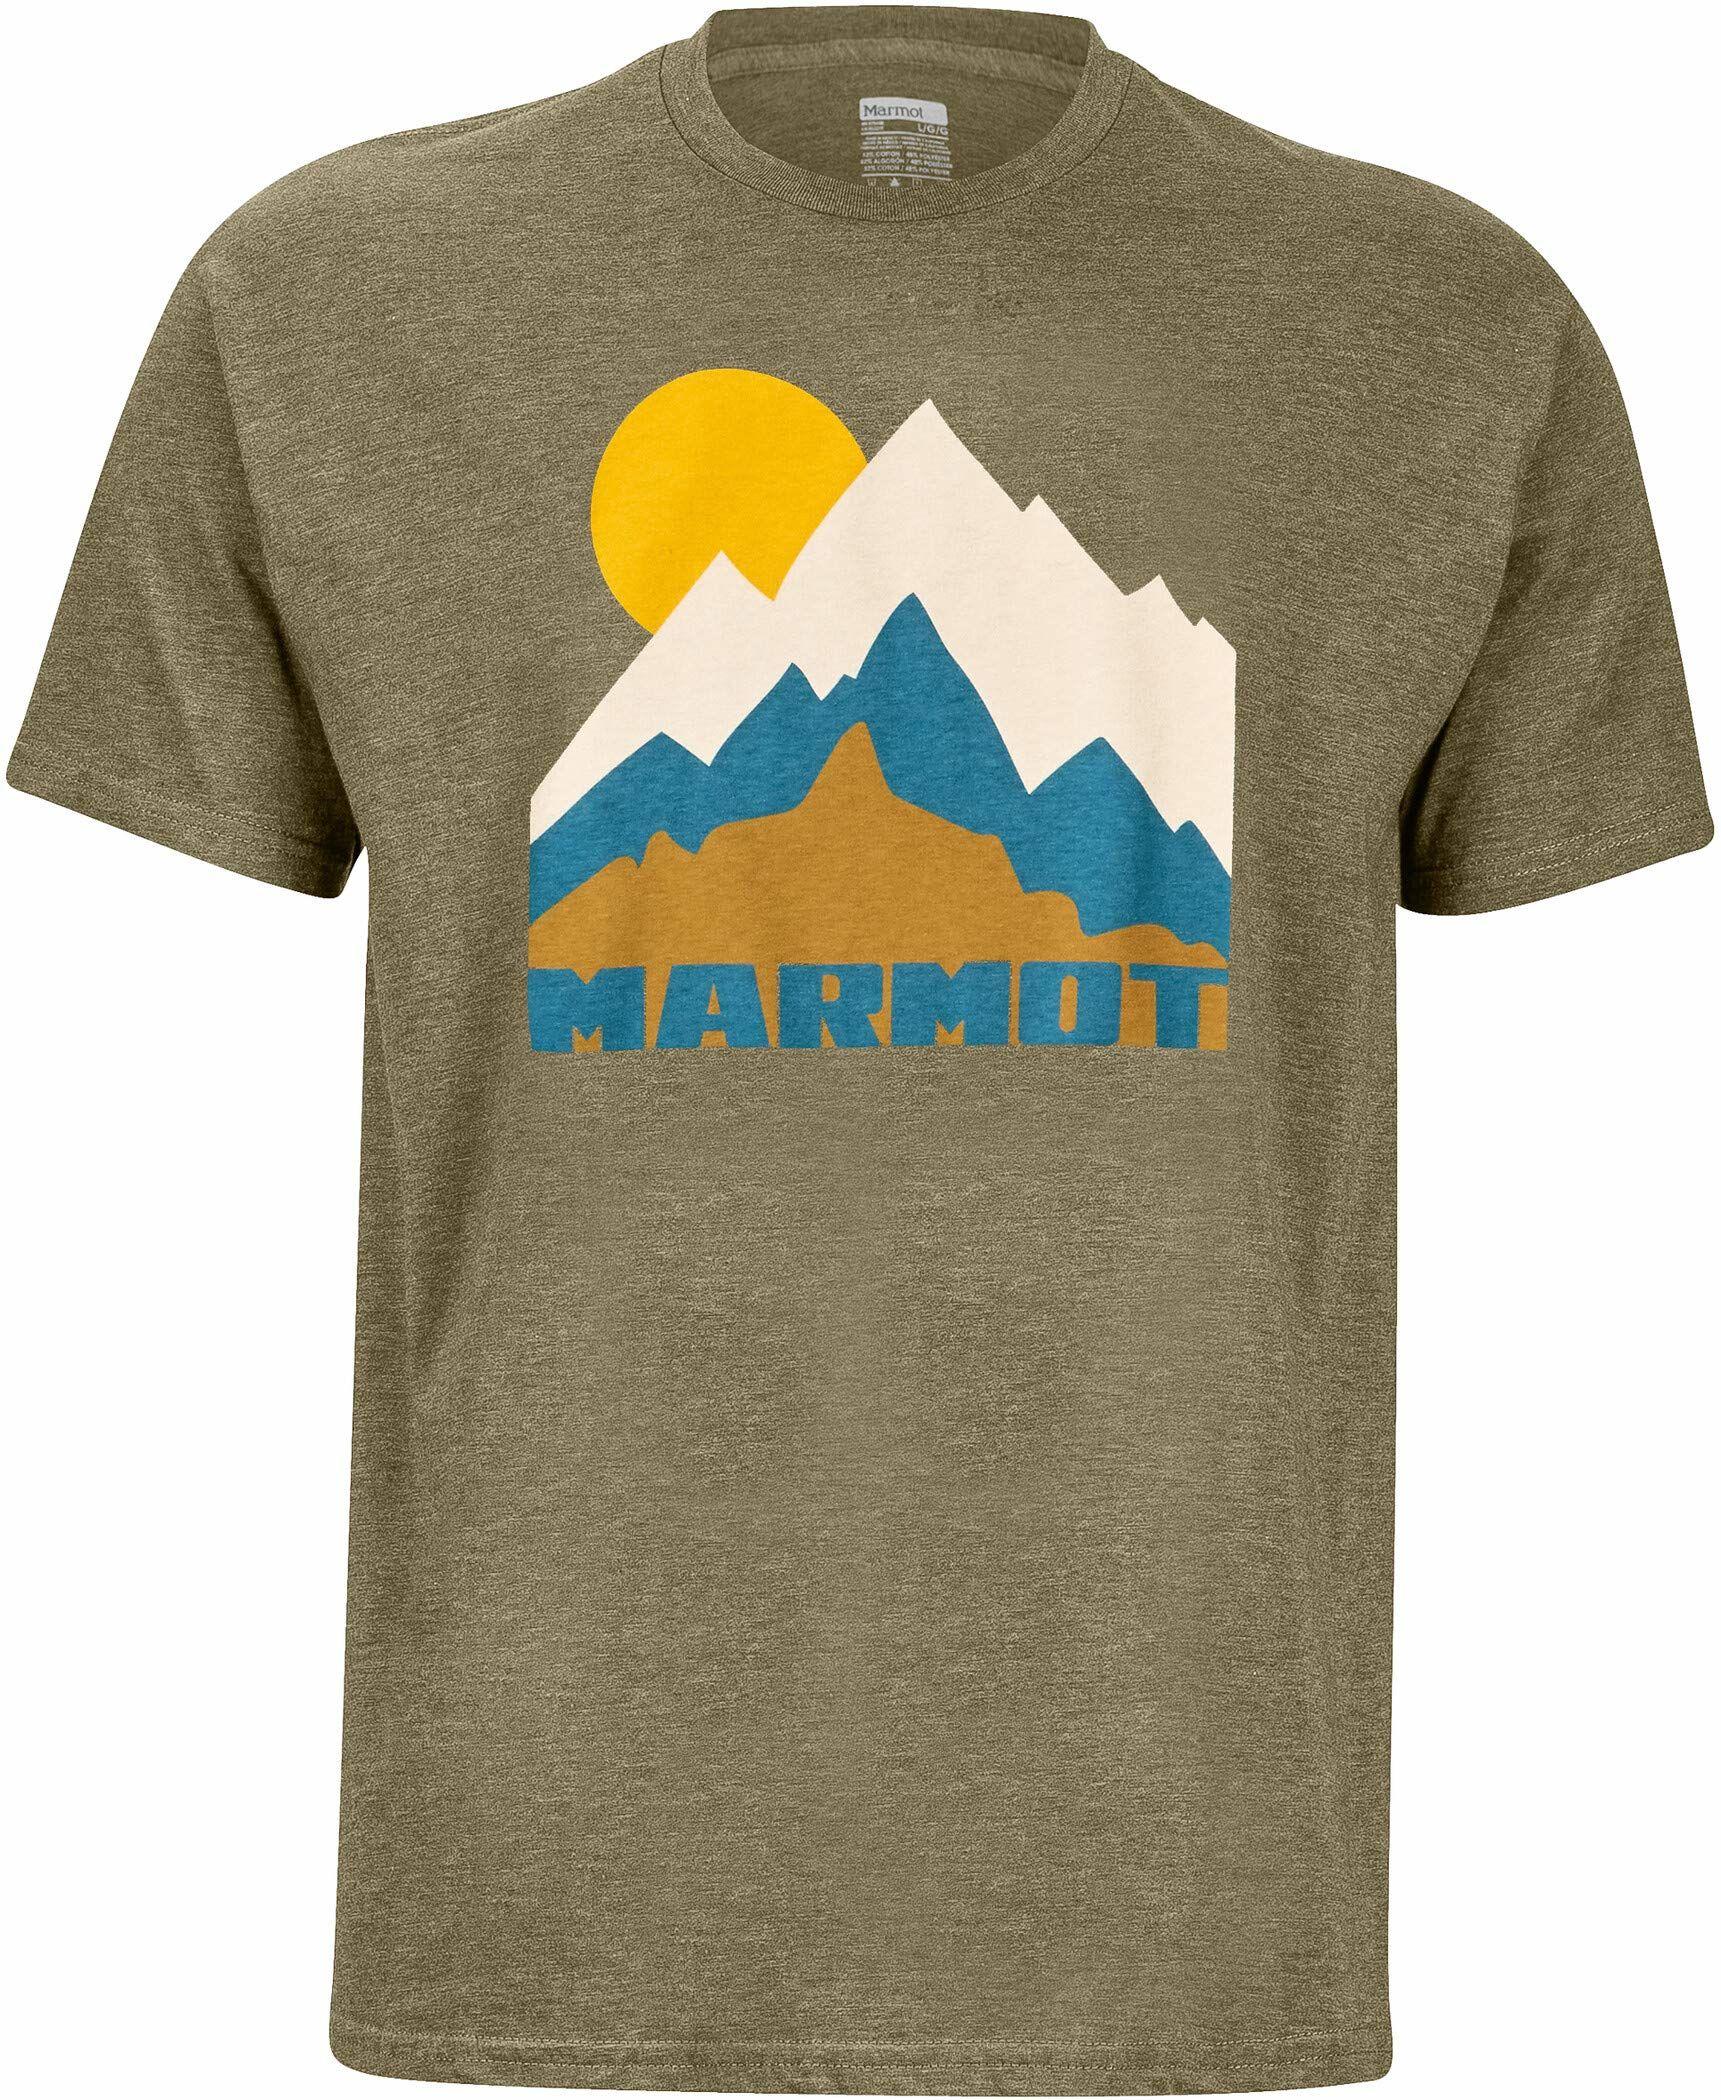 Marmot Męski T-shirt Tower T-shirt męski zielony Olive Heather S